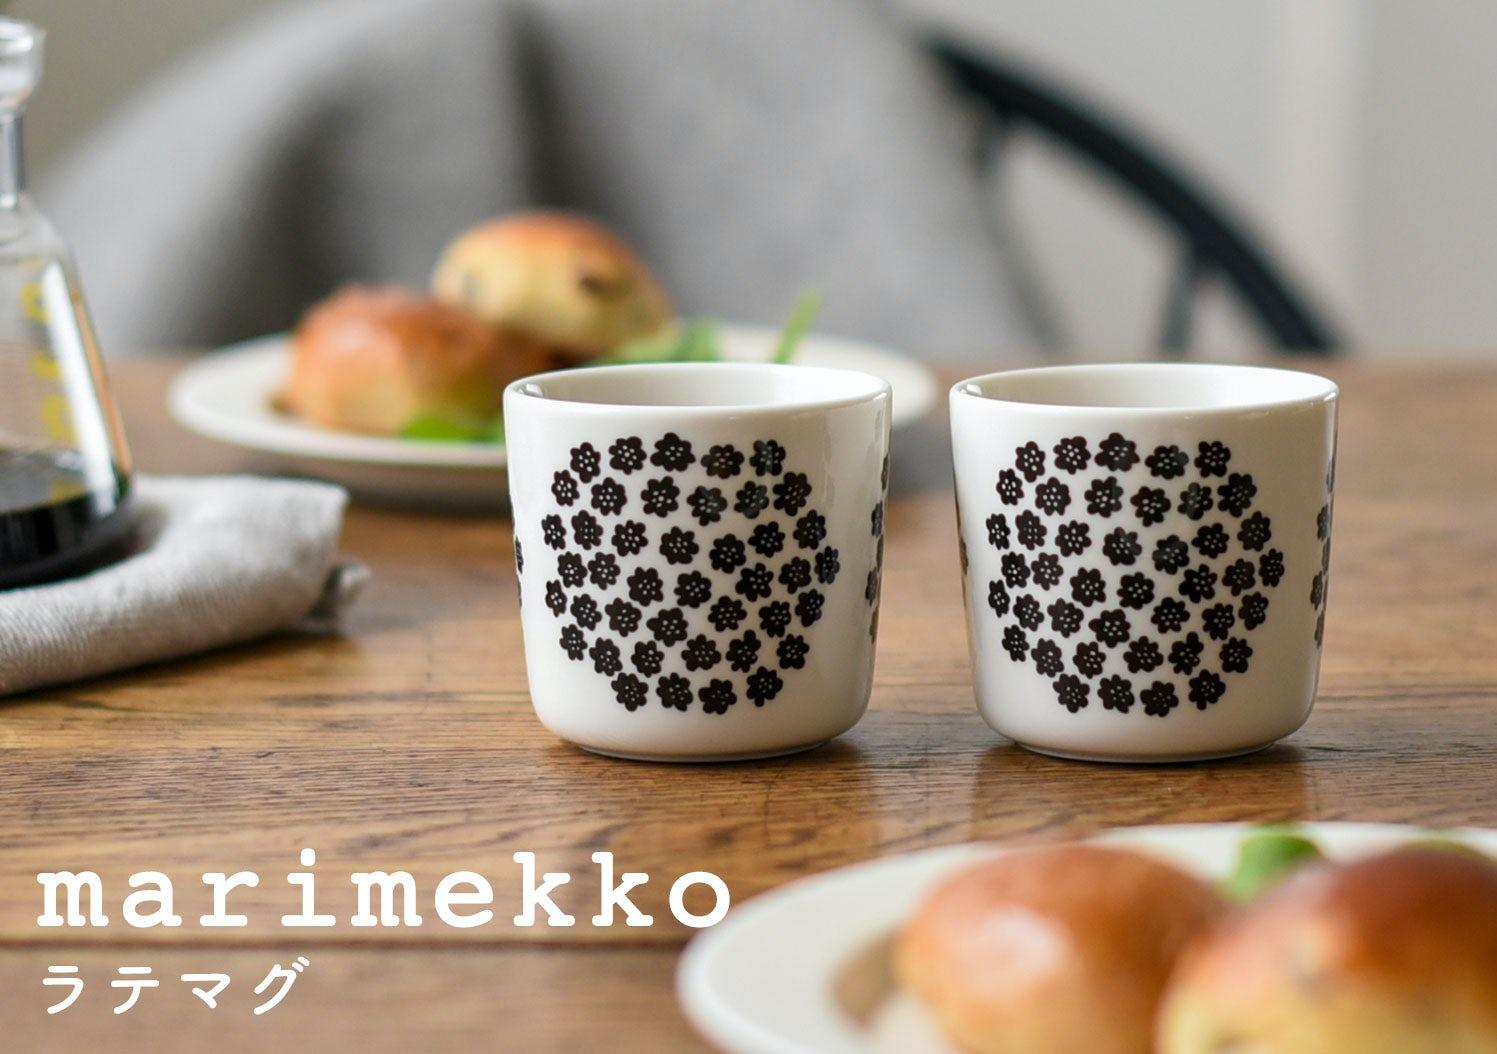 marimekko / マリメッコ / PUKETTIの画像